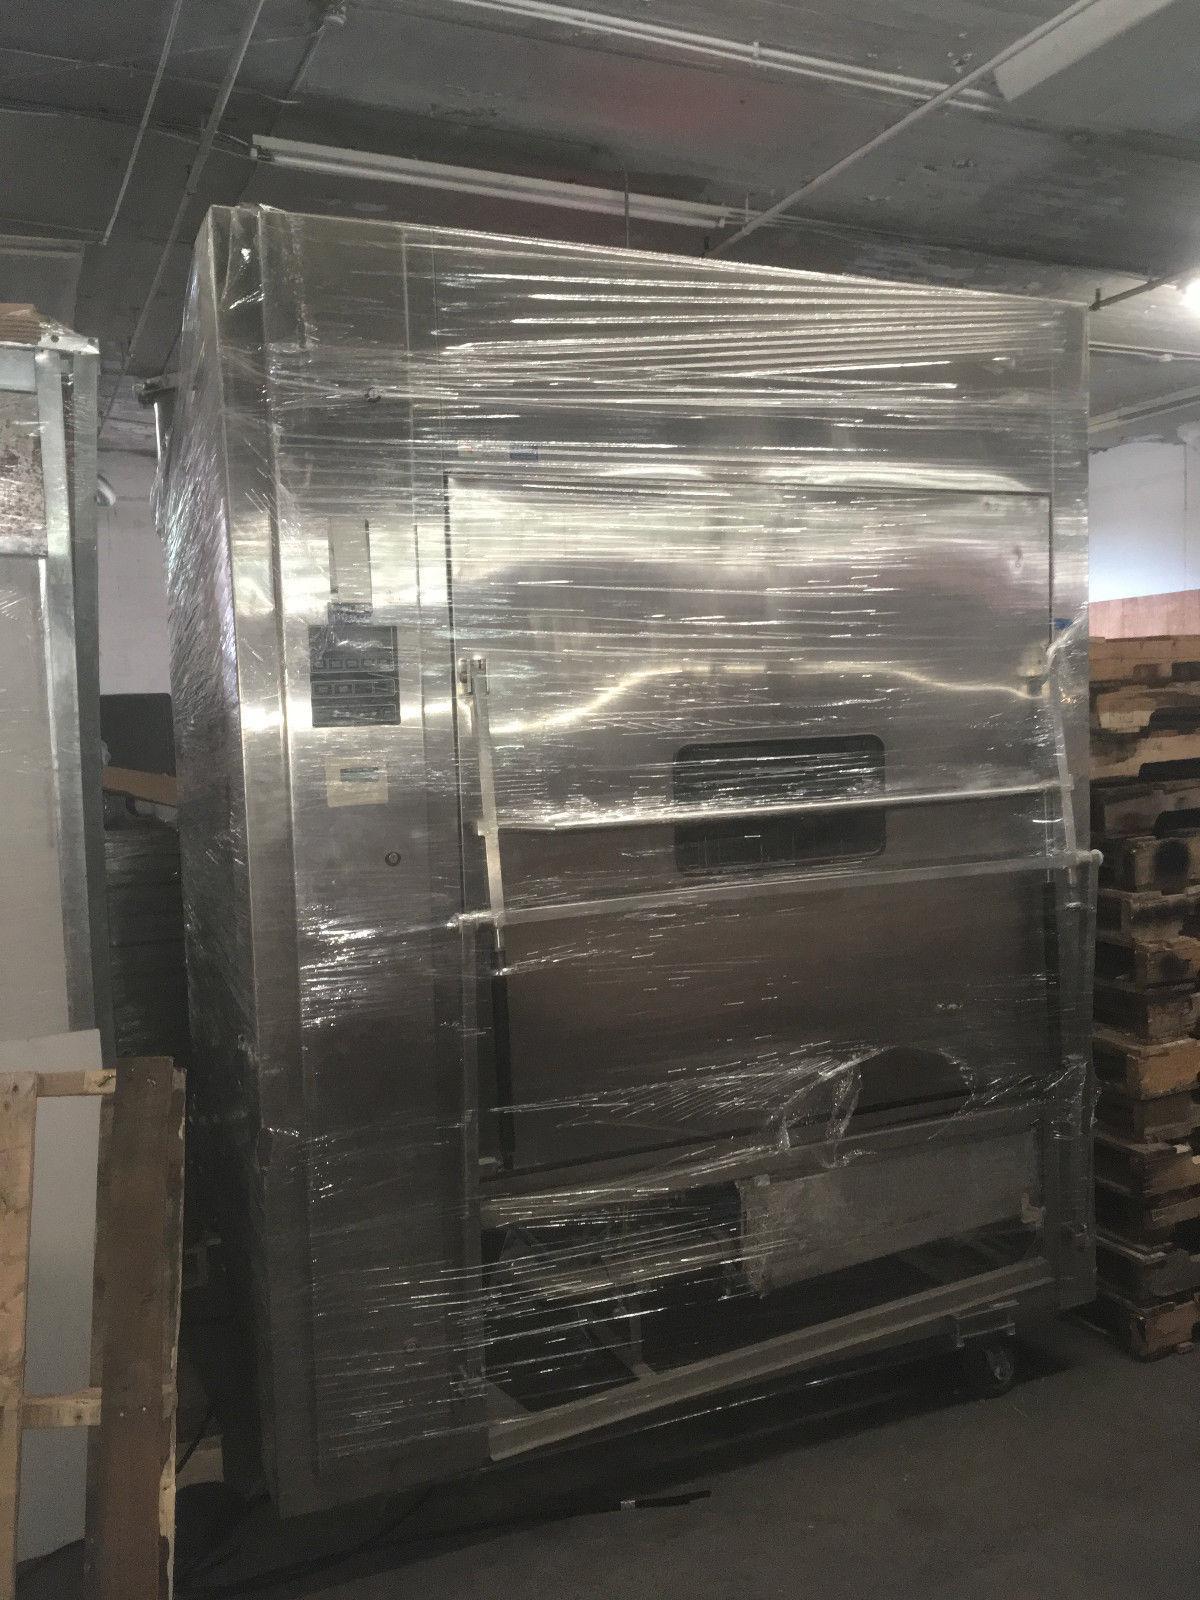 AMSCO Reliance Series 680 Glassware Washer for Laboratory